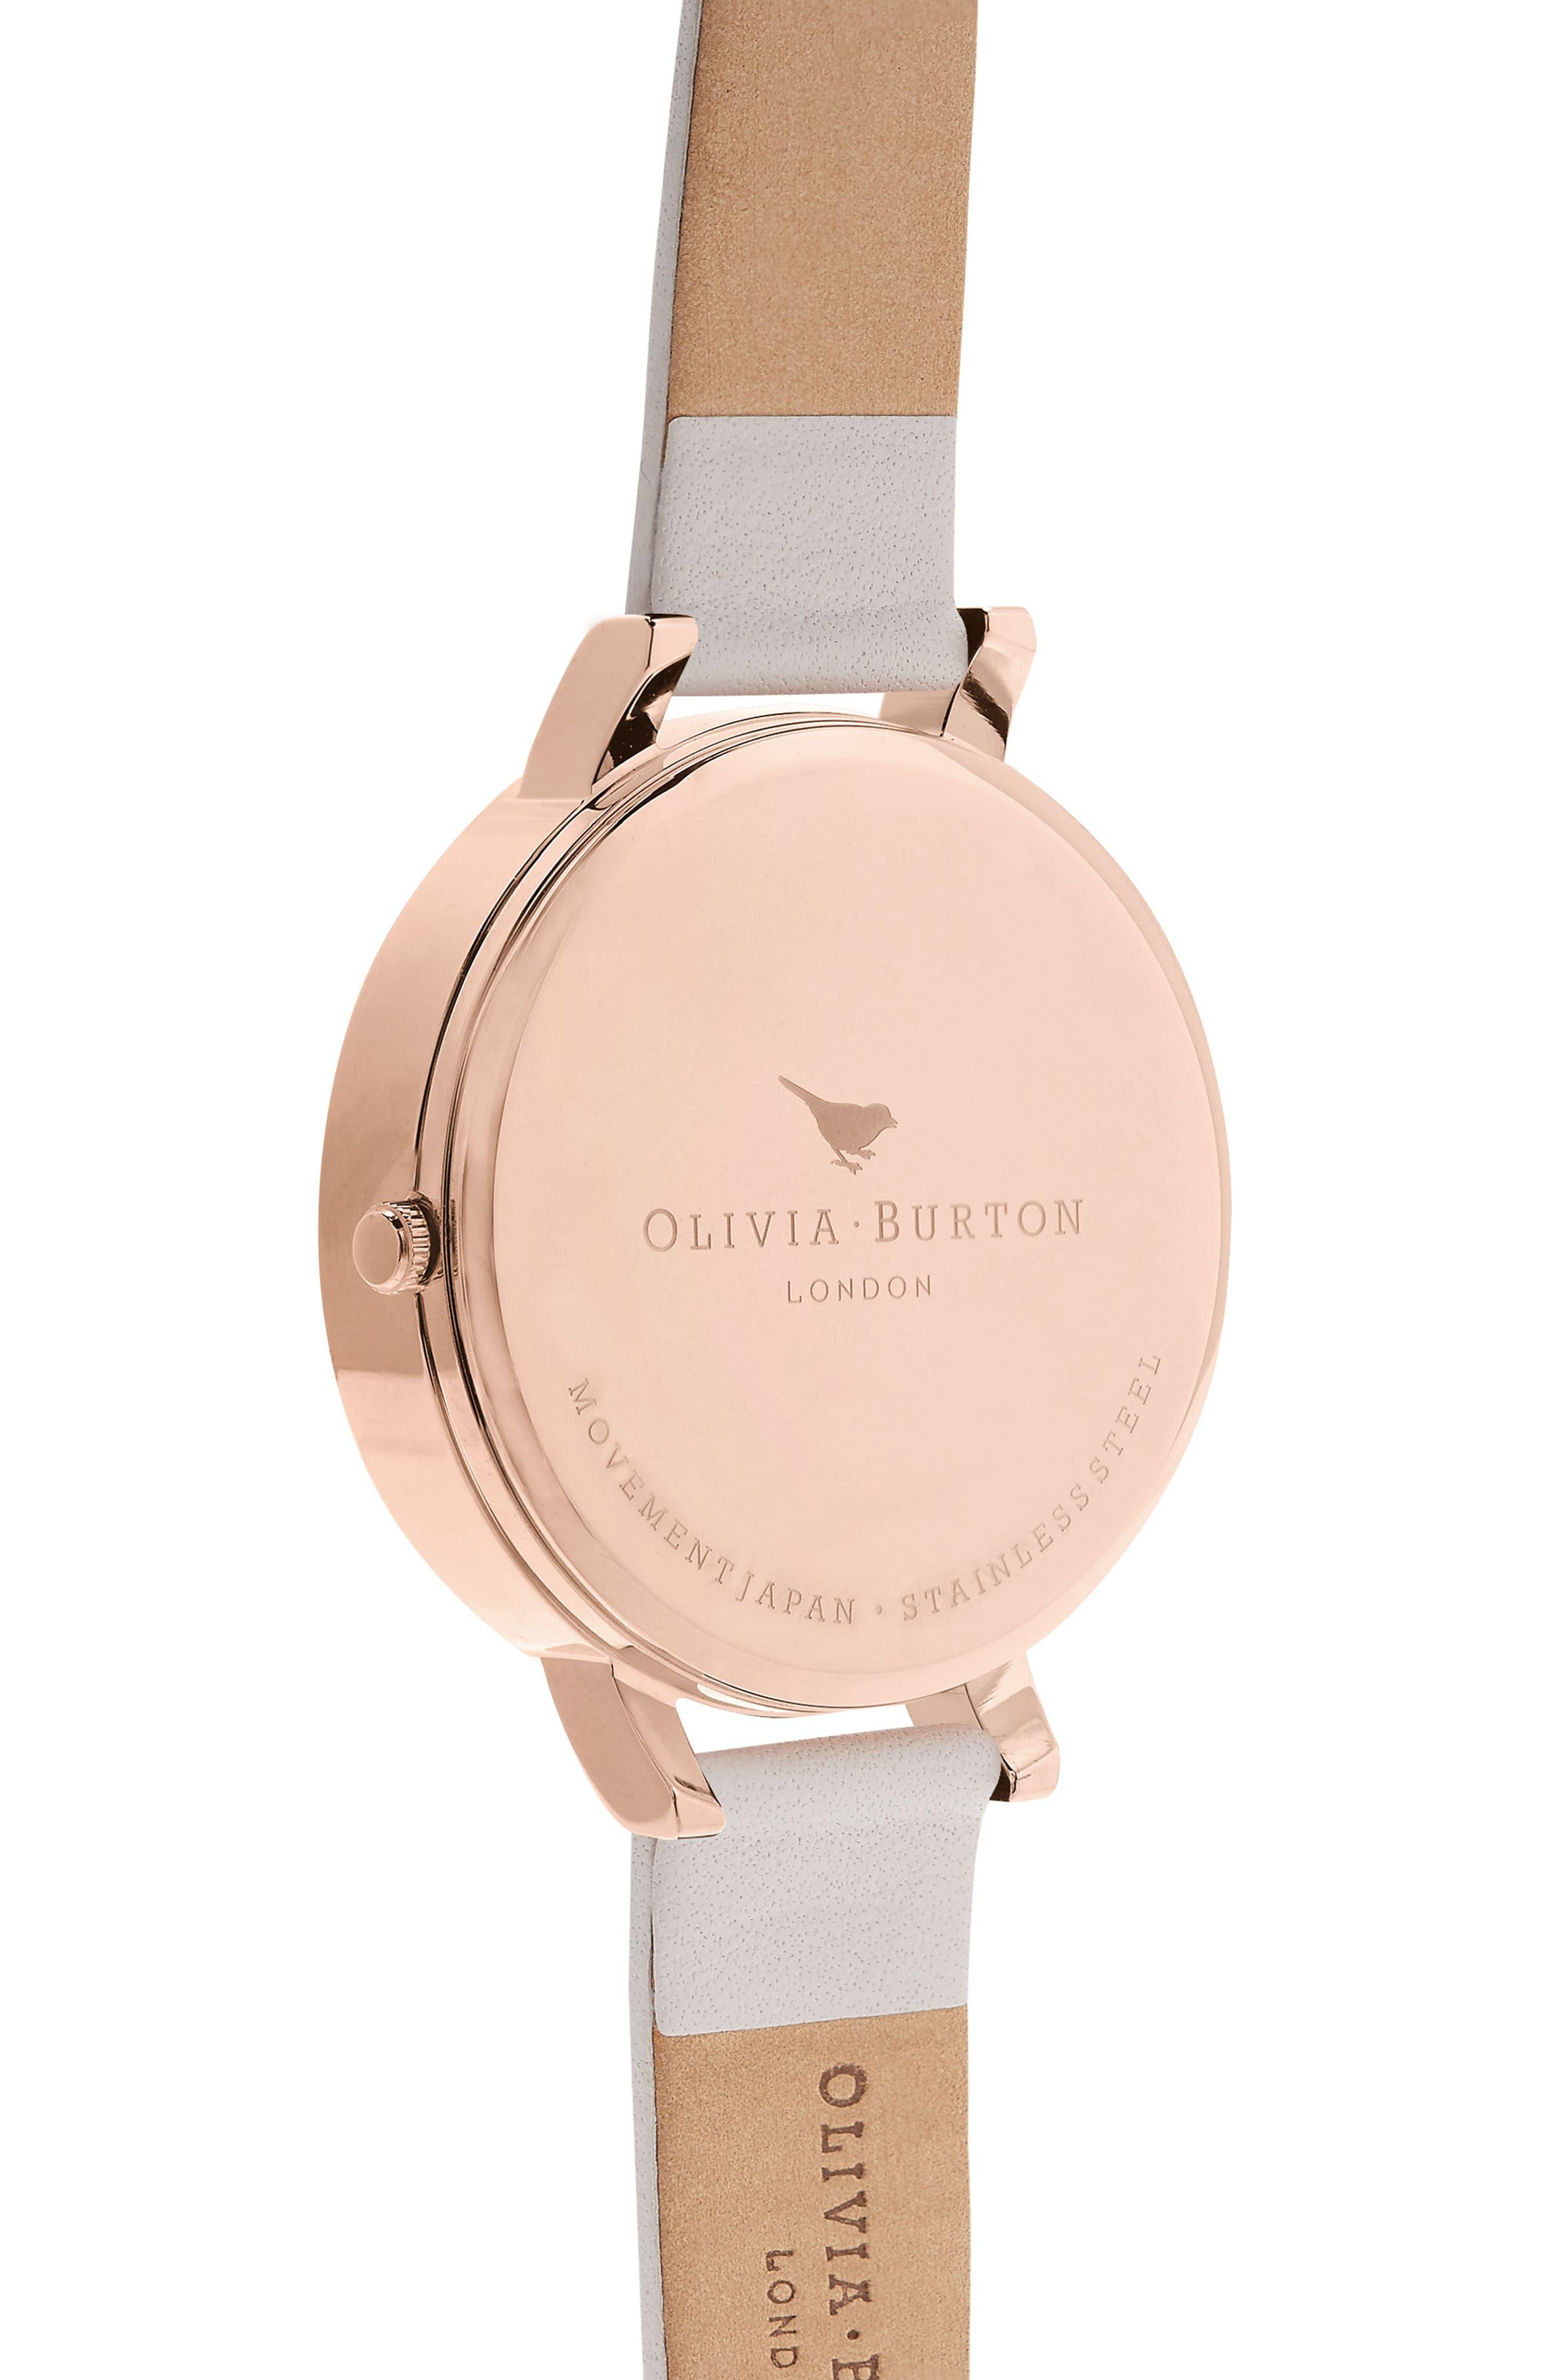 OLIVIA BURTON, Begin to Blush Leather Strap Watch, 38mm, Alternate thumbnail 2, color, 650